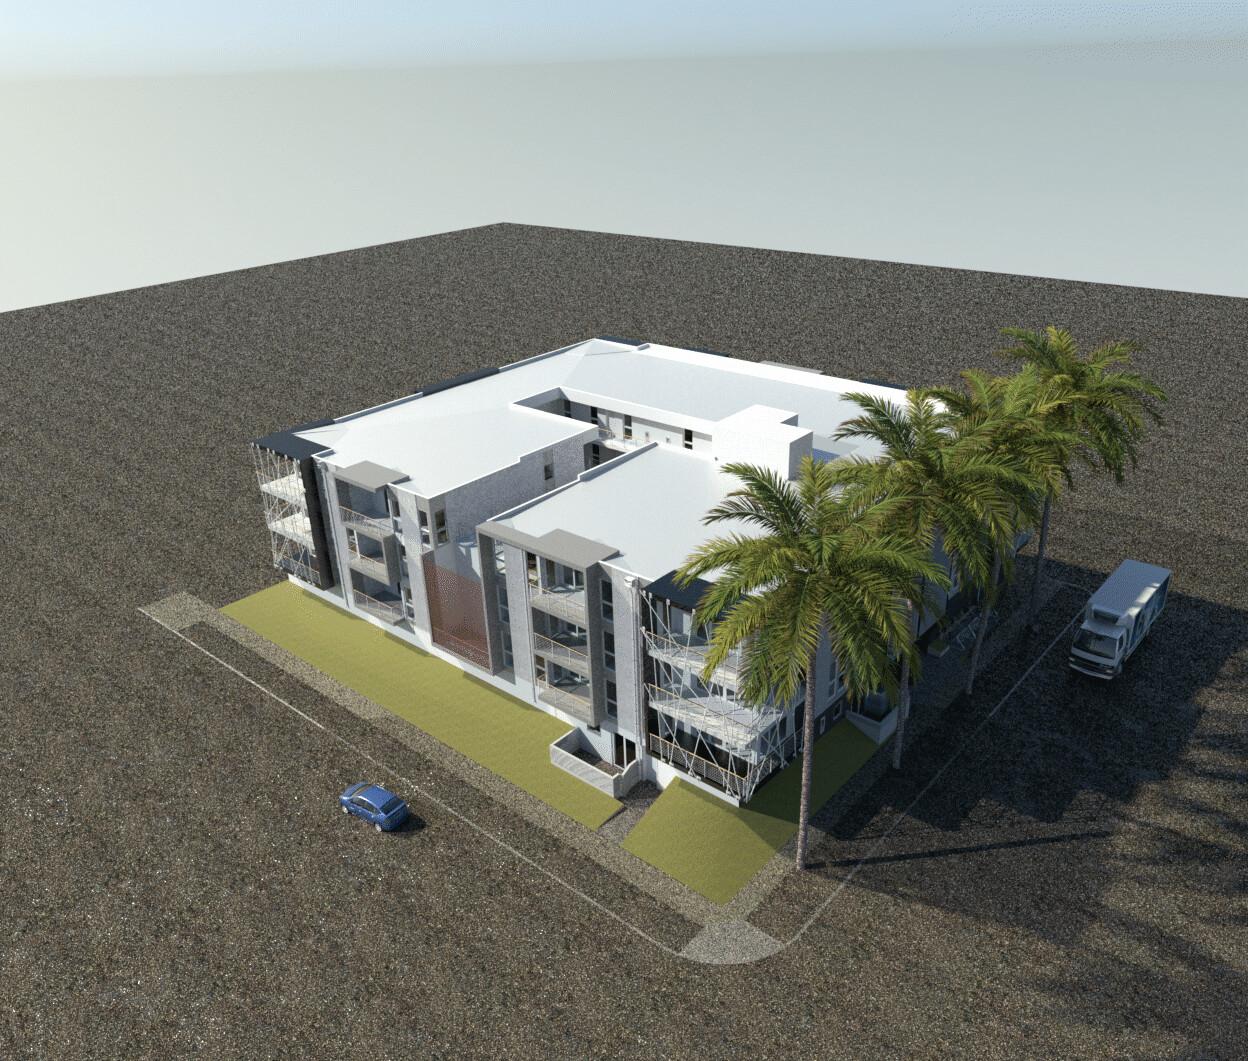 Old Work - WIP progress render for Minarc.